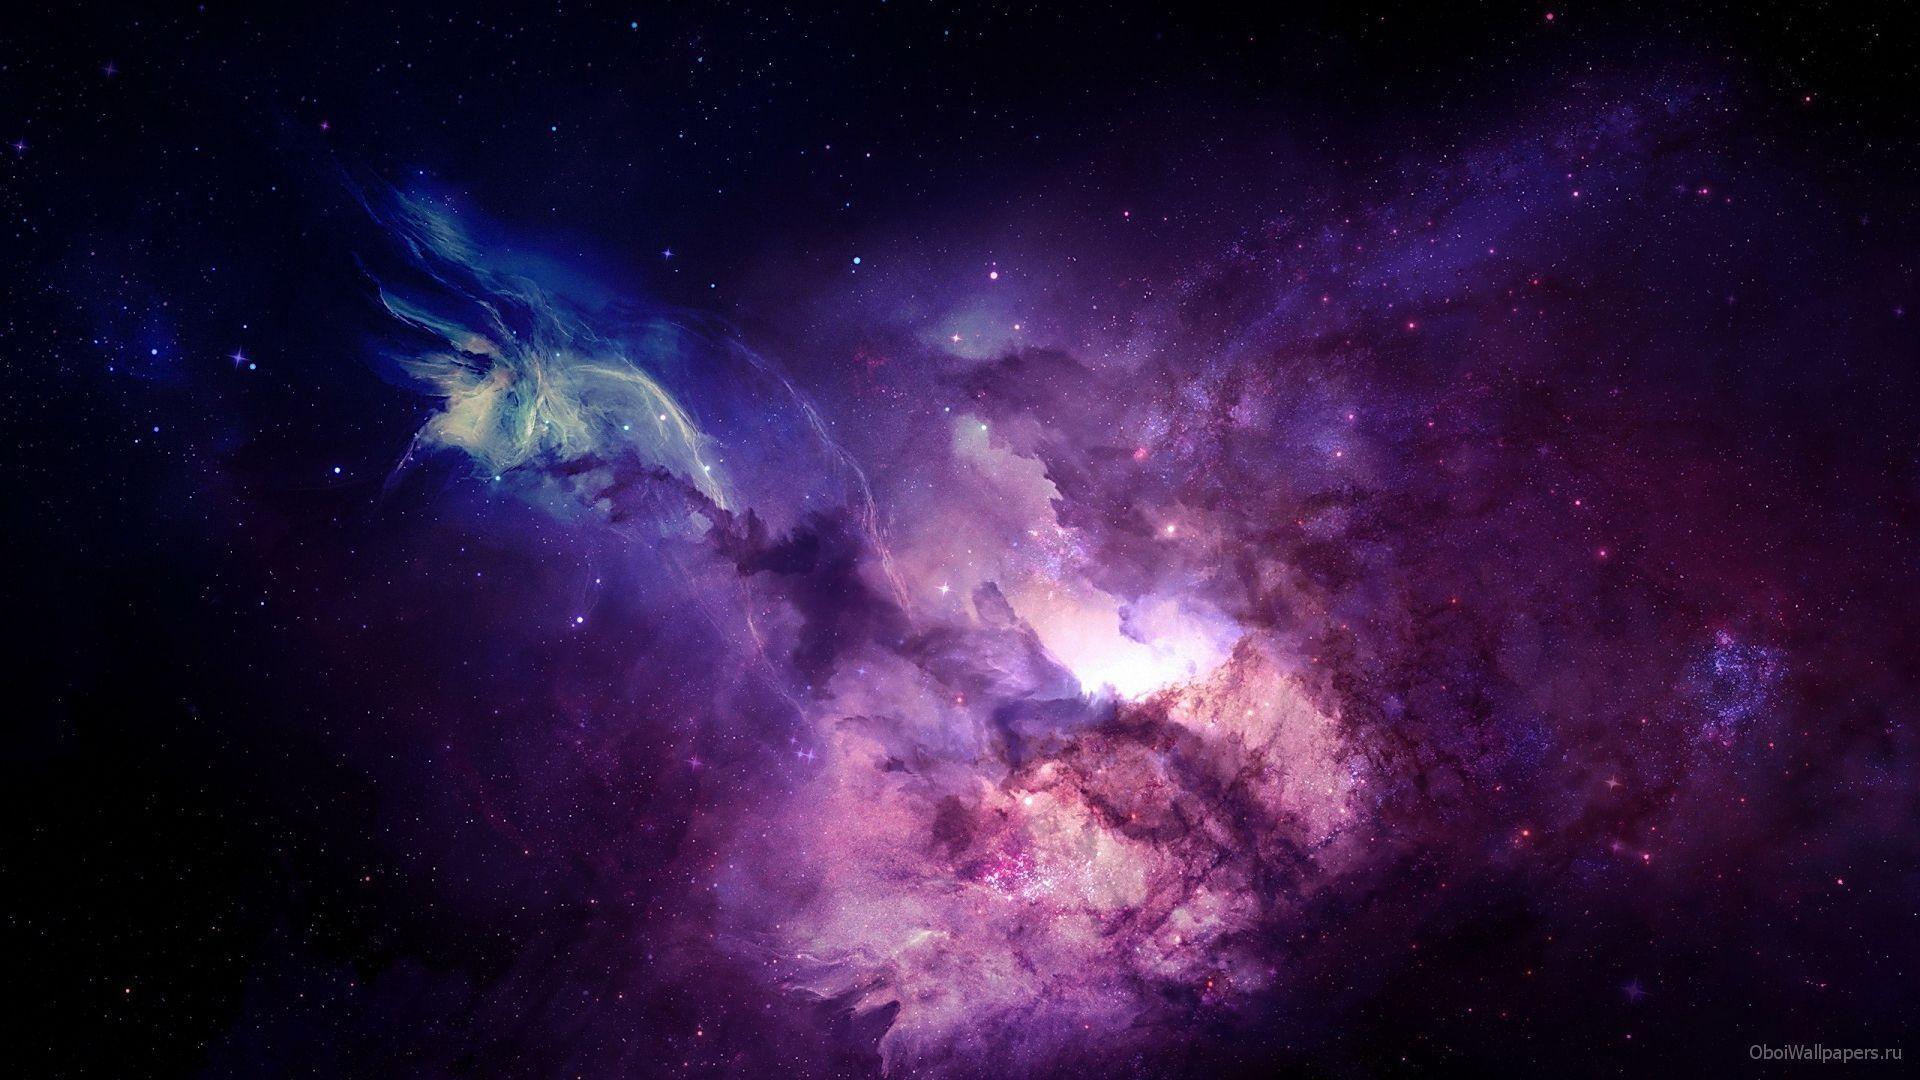 High Resolution Space Image desktop wallpaper